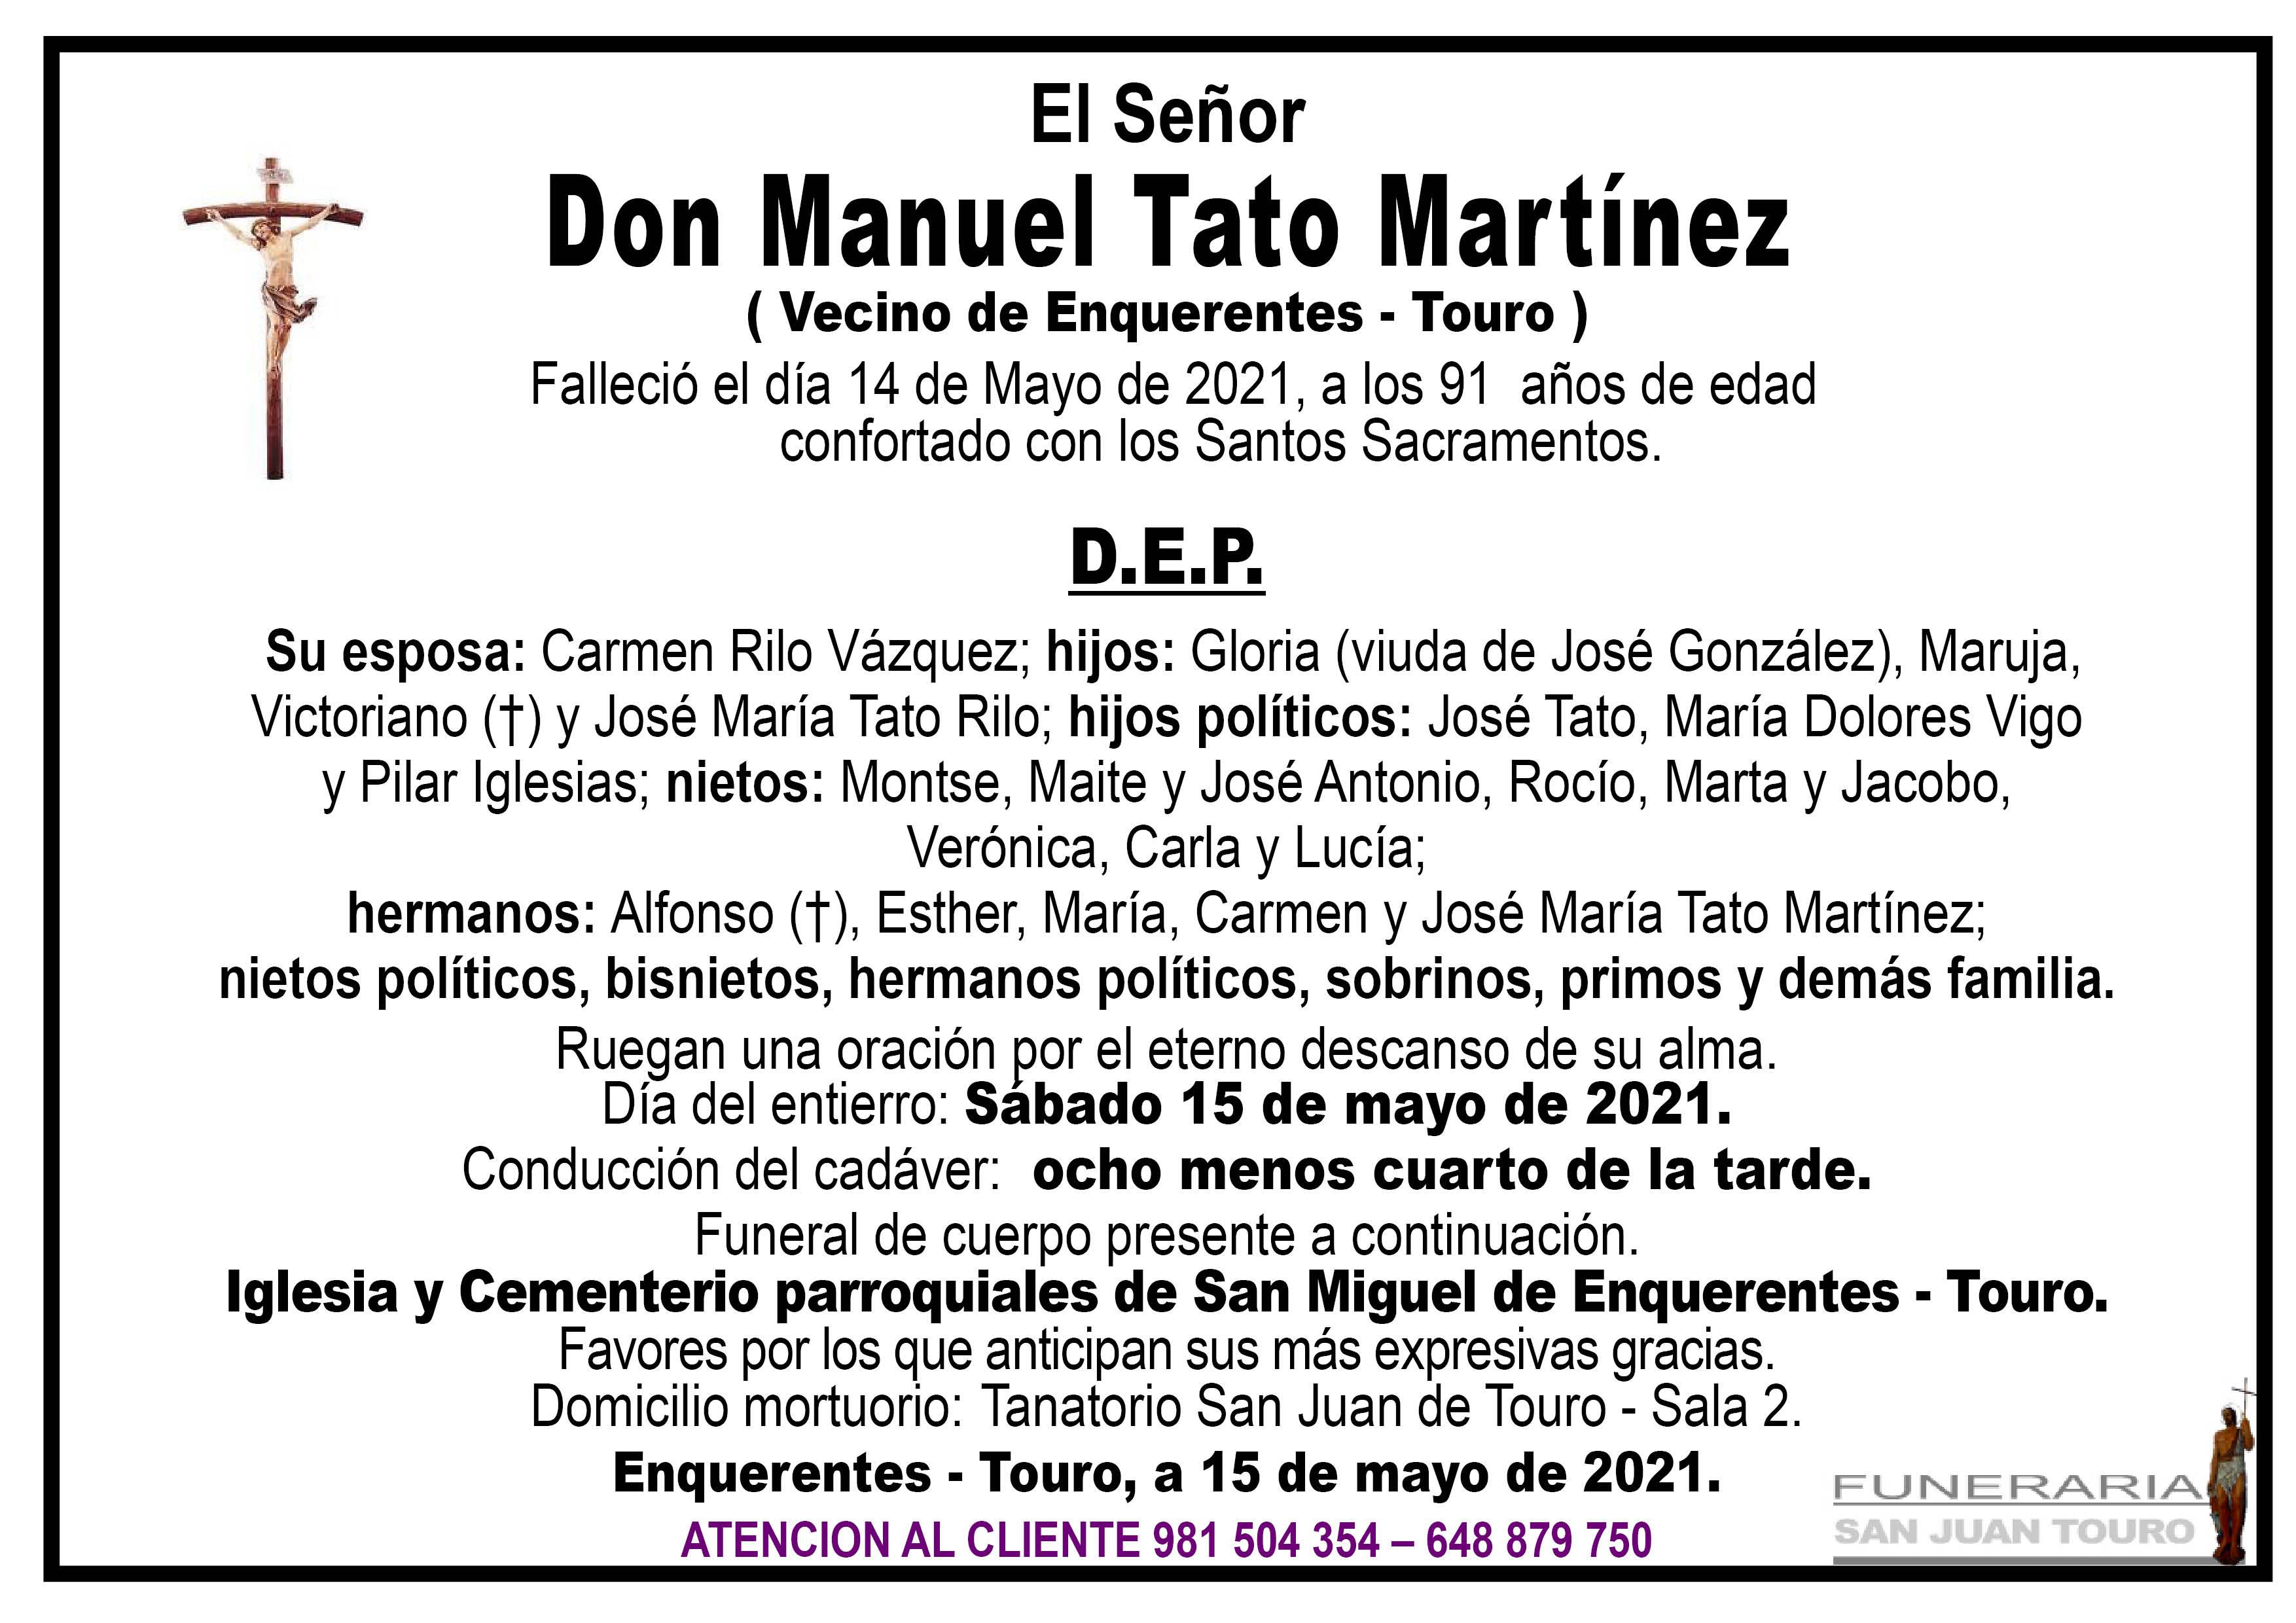 Esquela de SEPELIO DE DON MANUEL TATO MARTÍNEZ